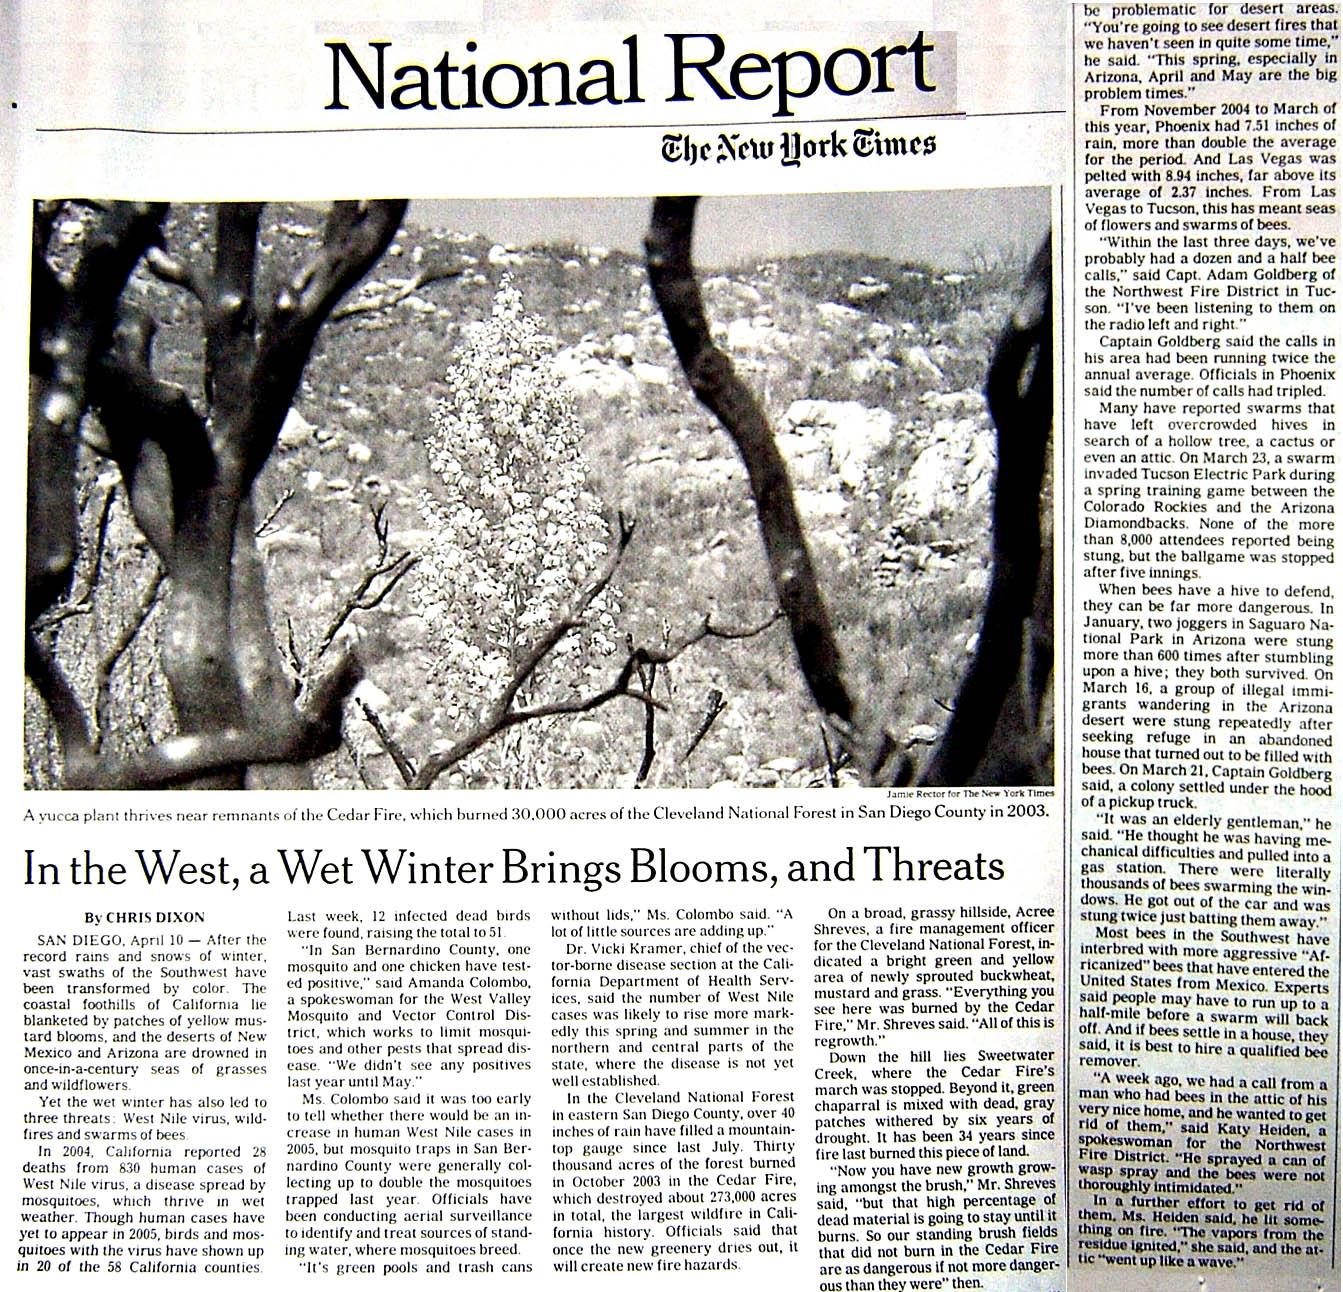 NYT News